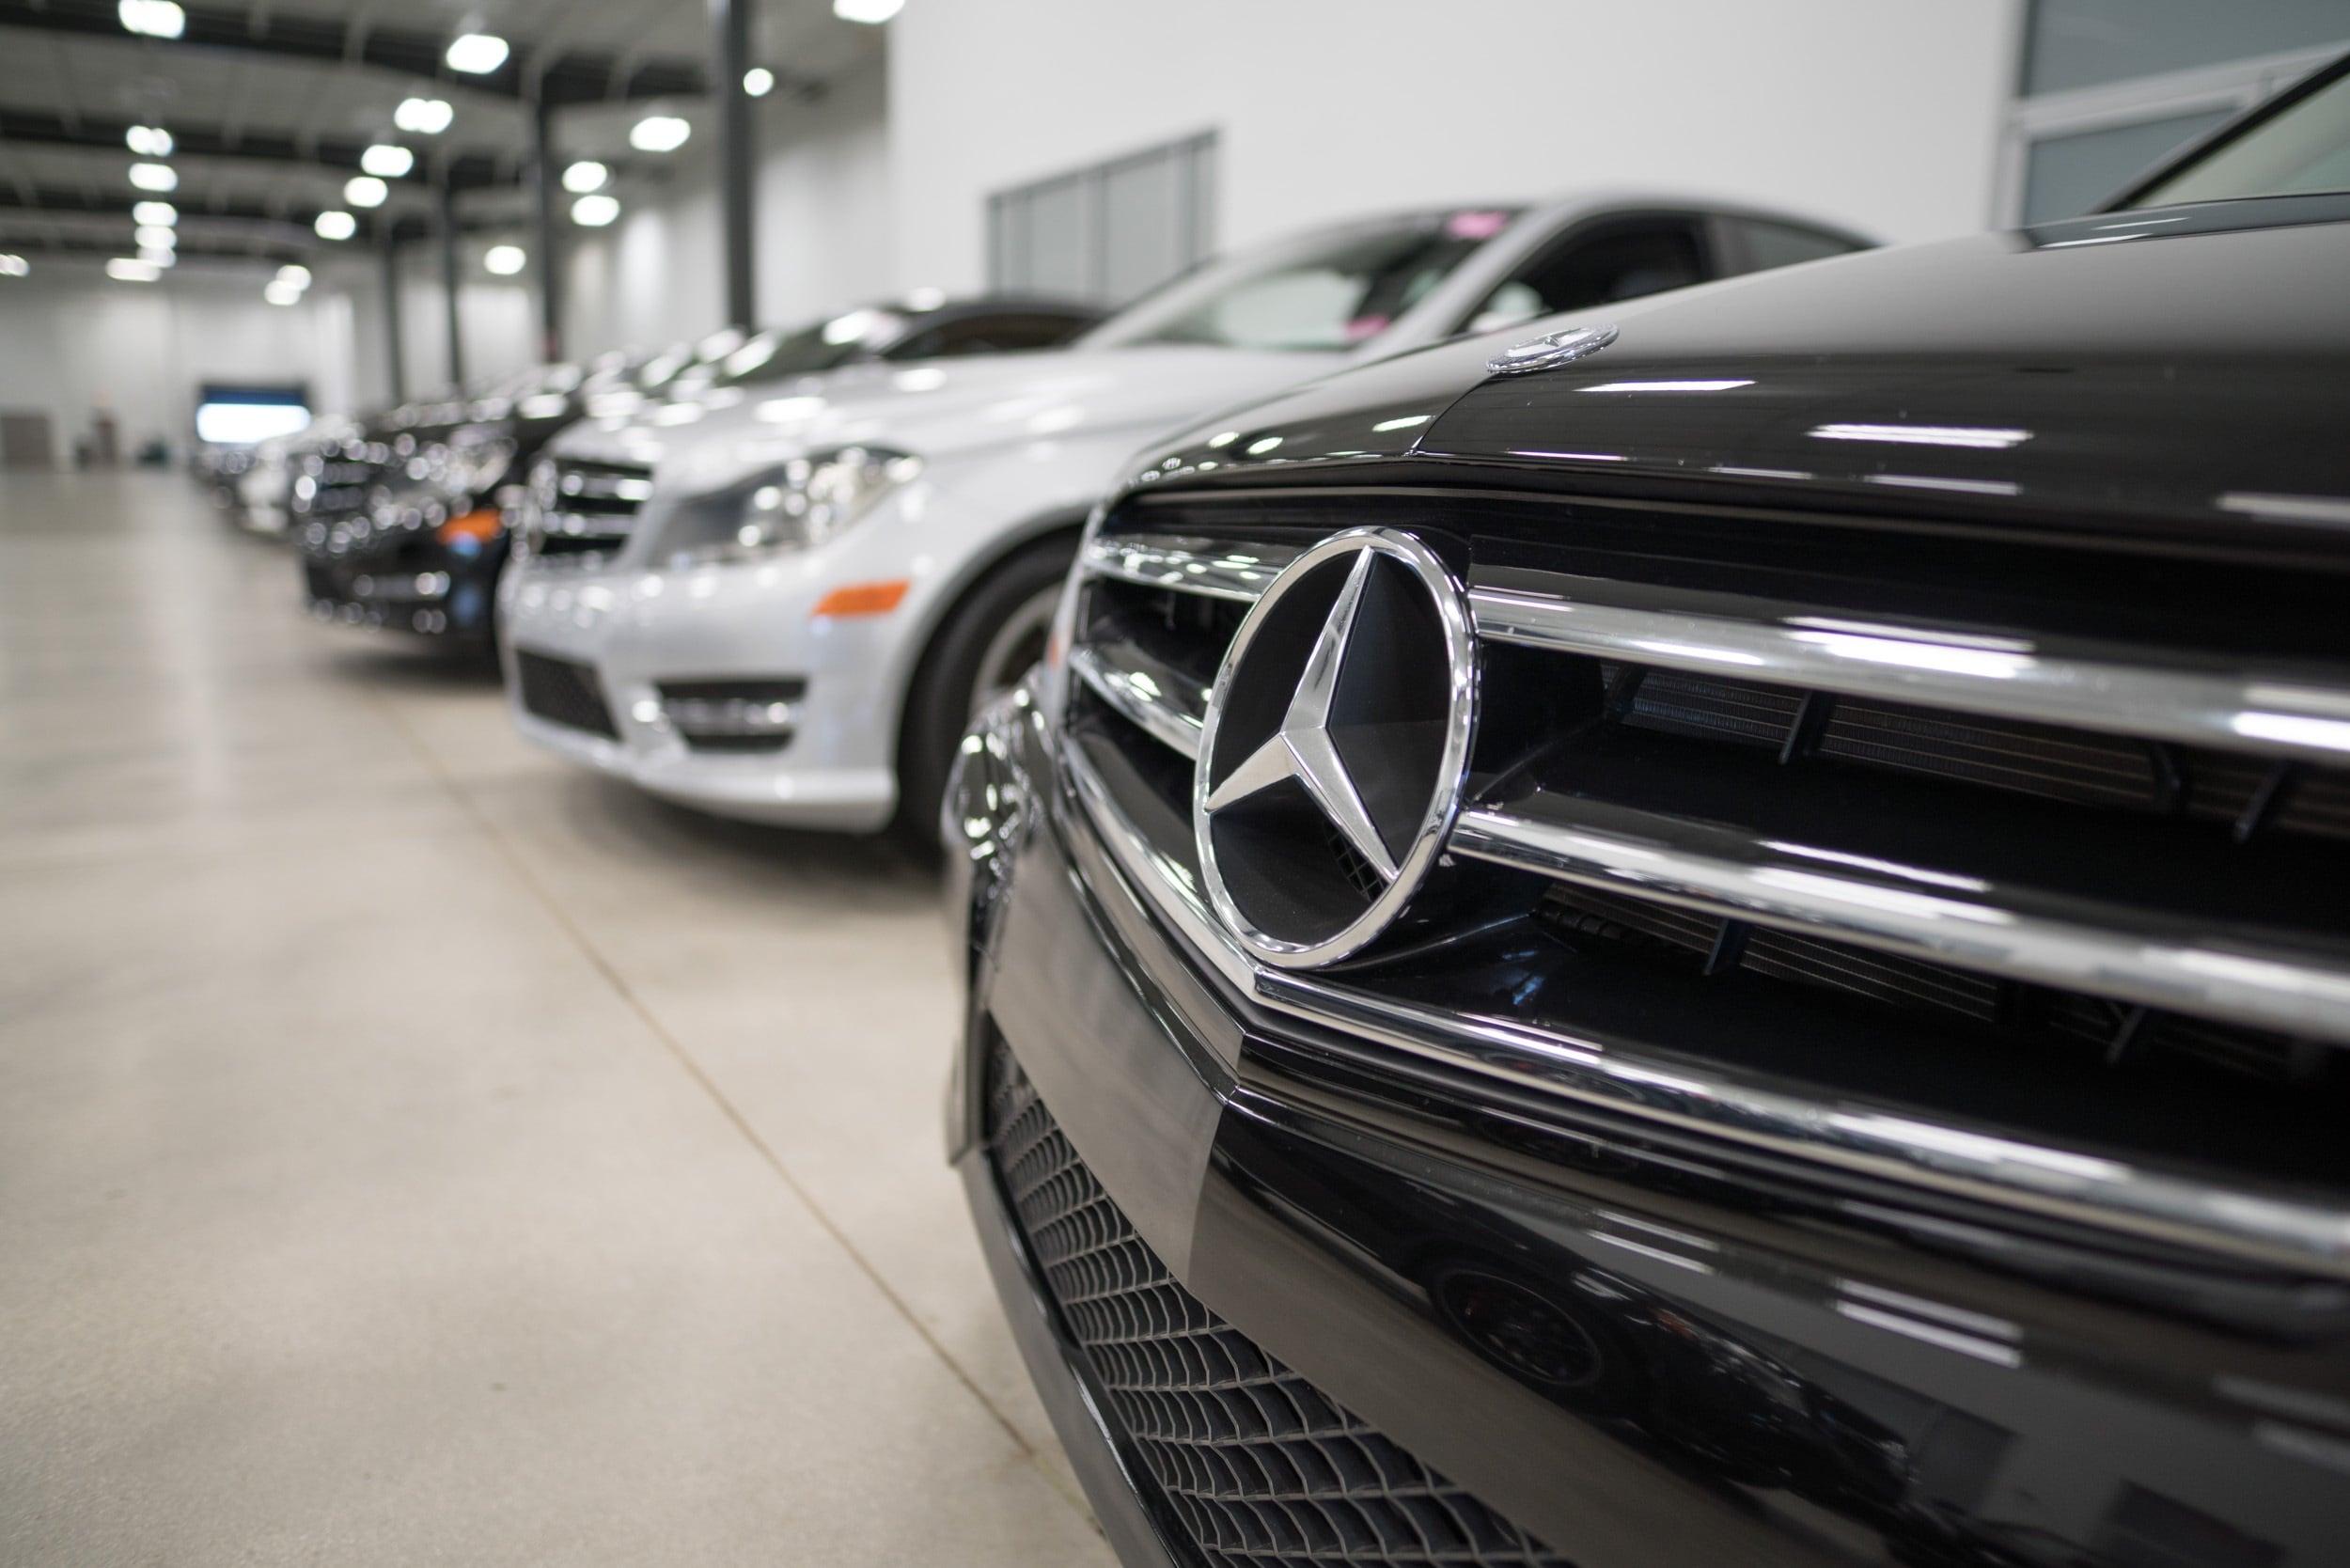 MercedesBenz Dealership Near Me Houston TX MercedesBenz Of - Www mercedes benz dealers